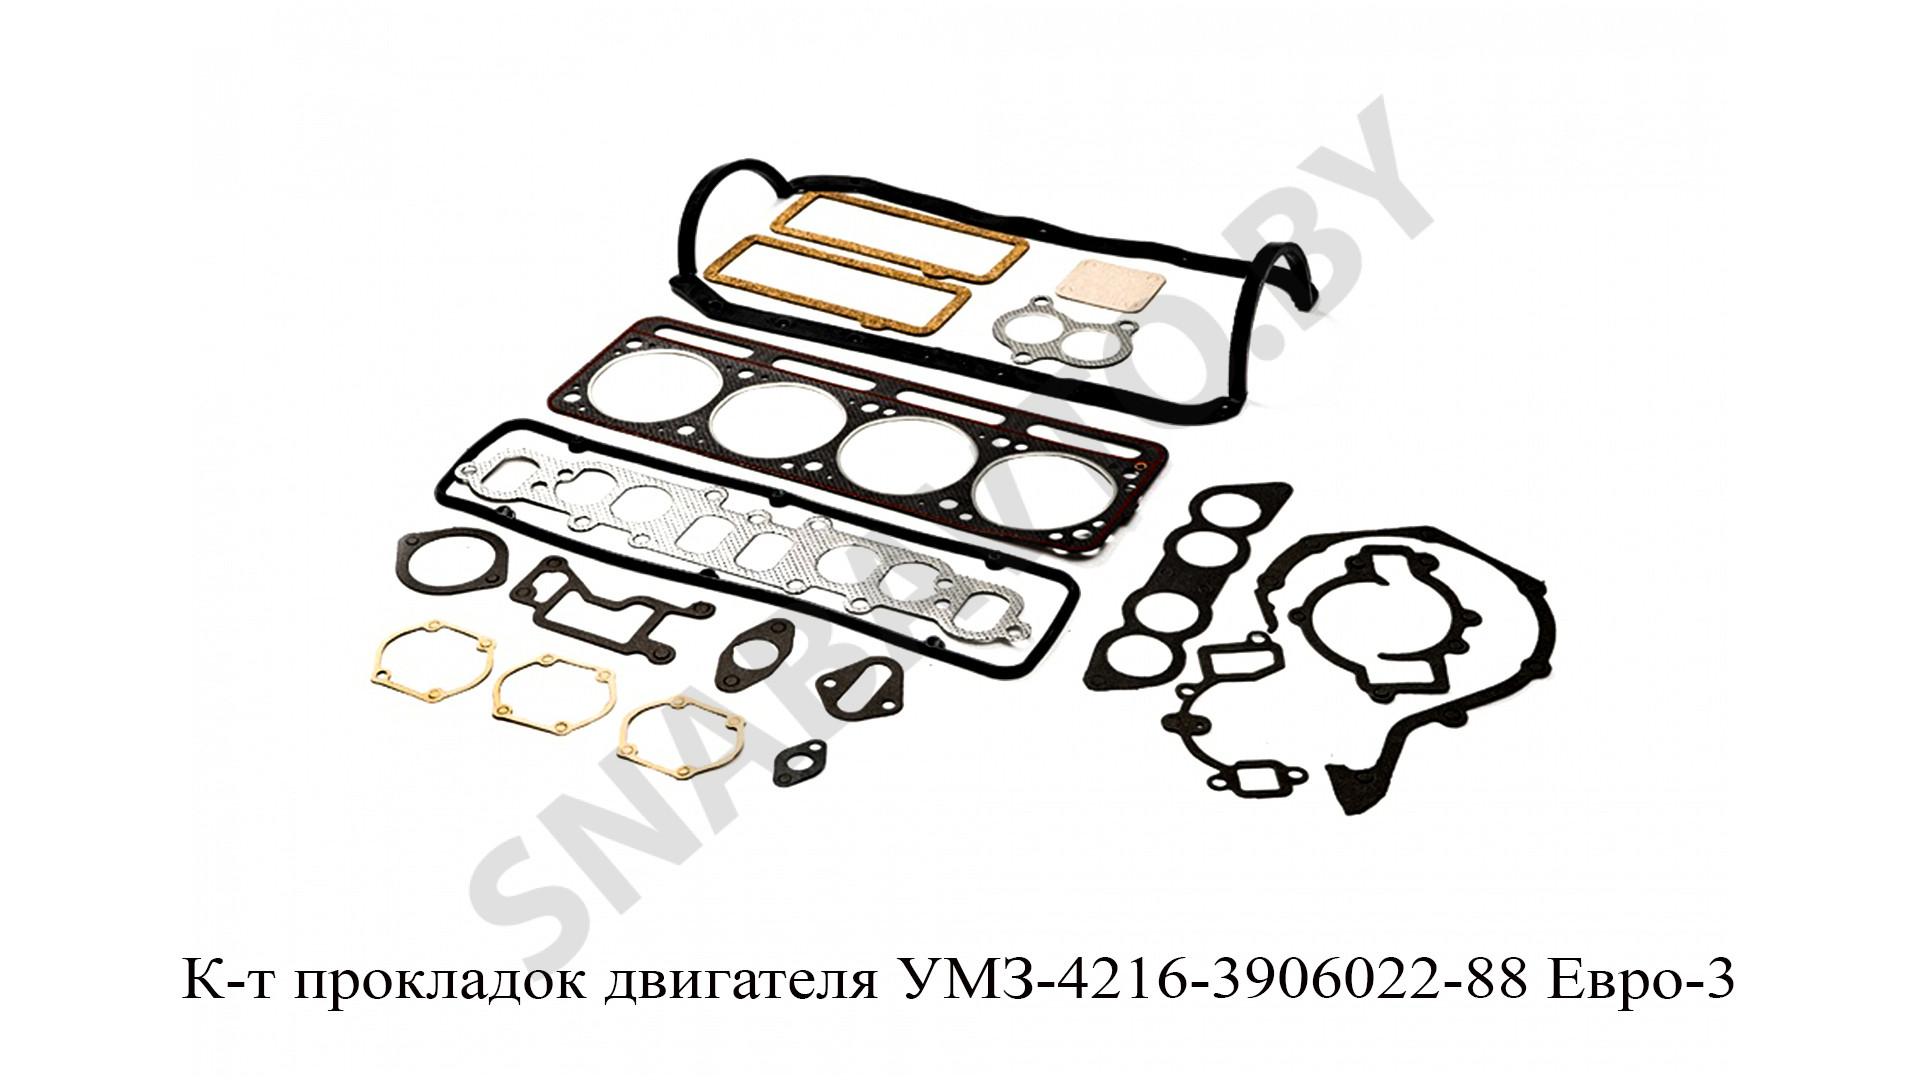 К-т прокладок двигателя УМЗ Евро-3